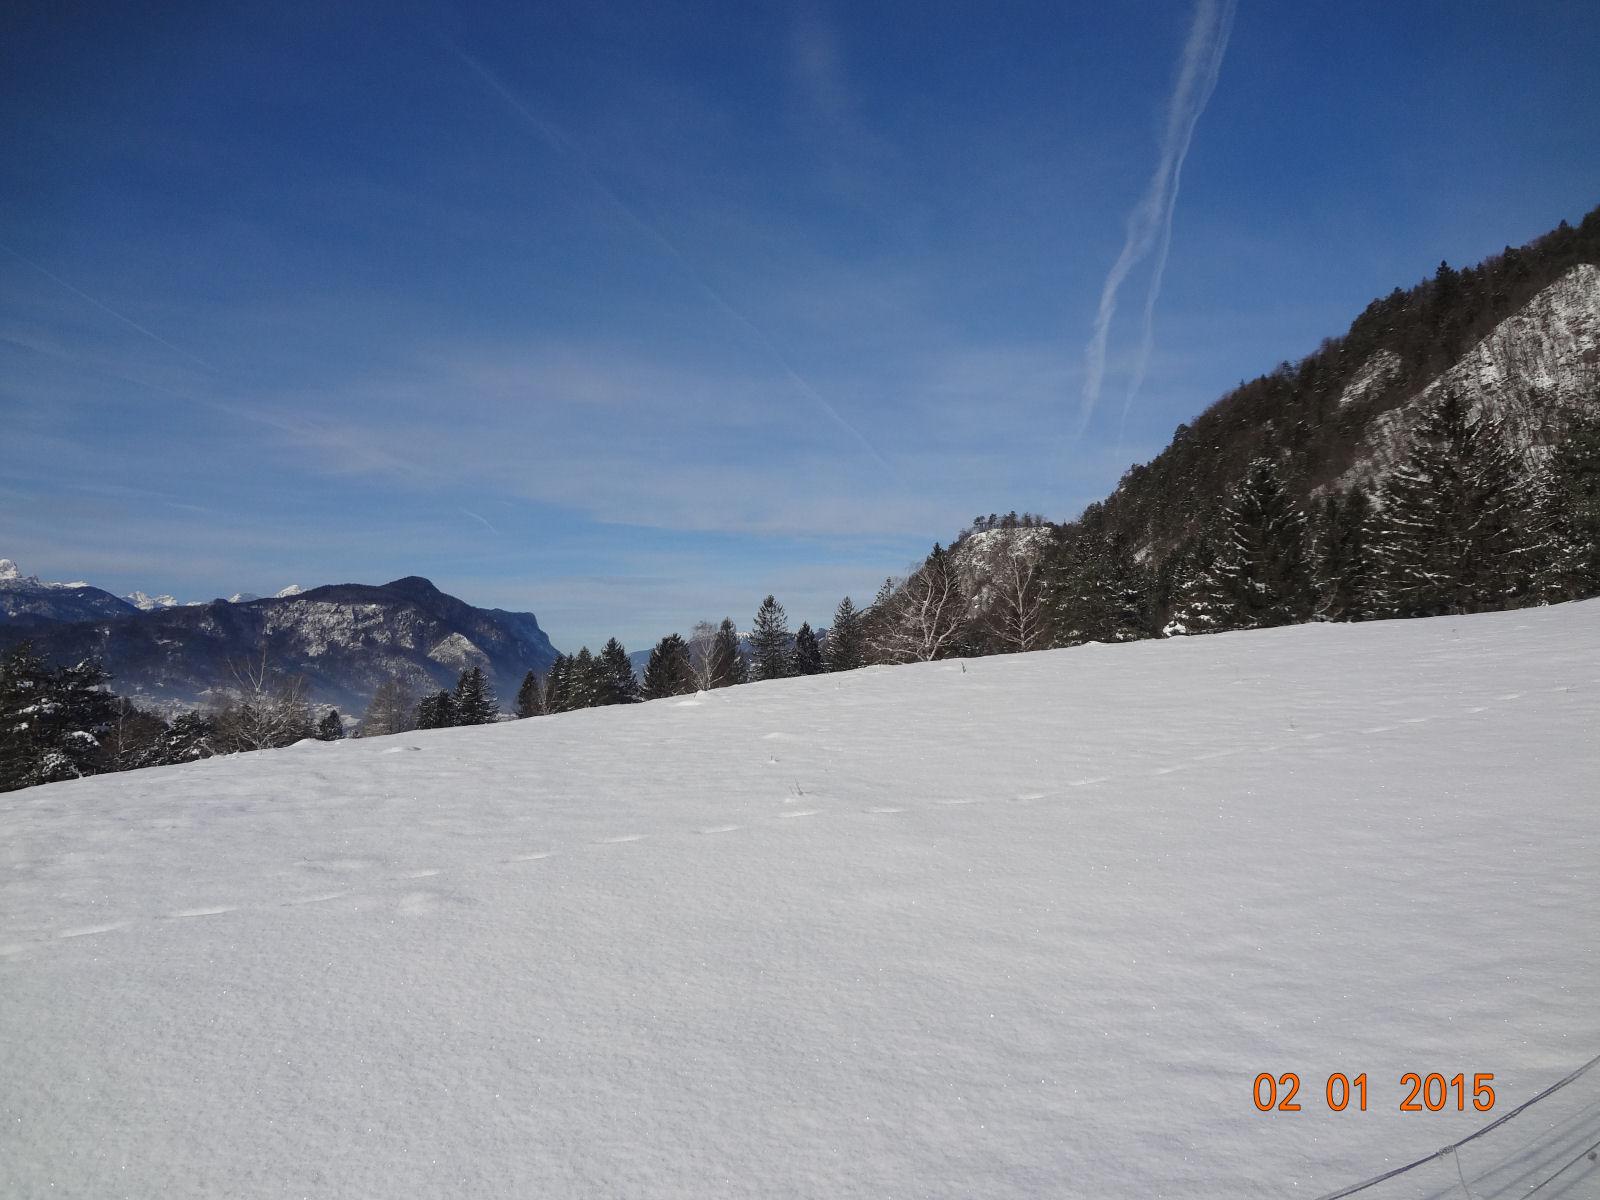 Slovenian Alps on a sunny winter day